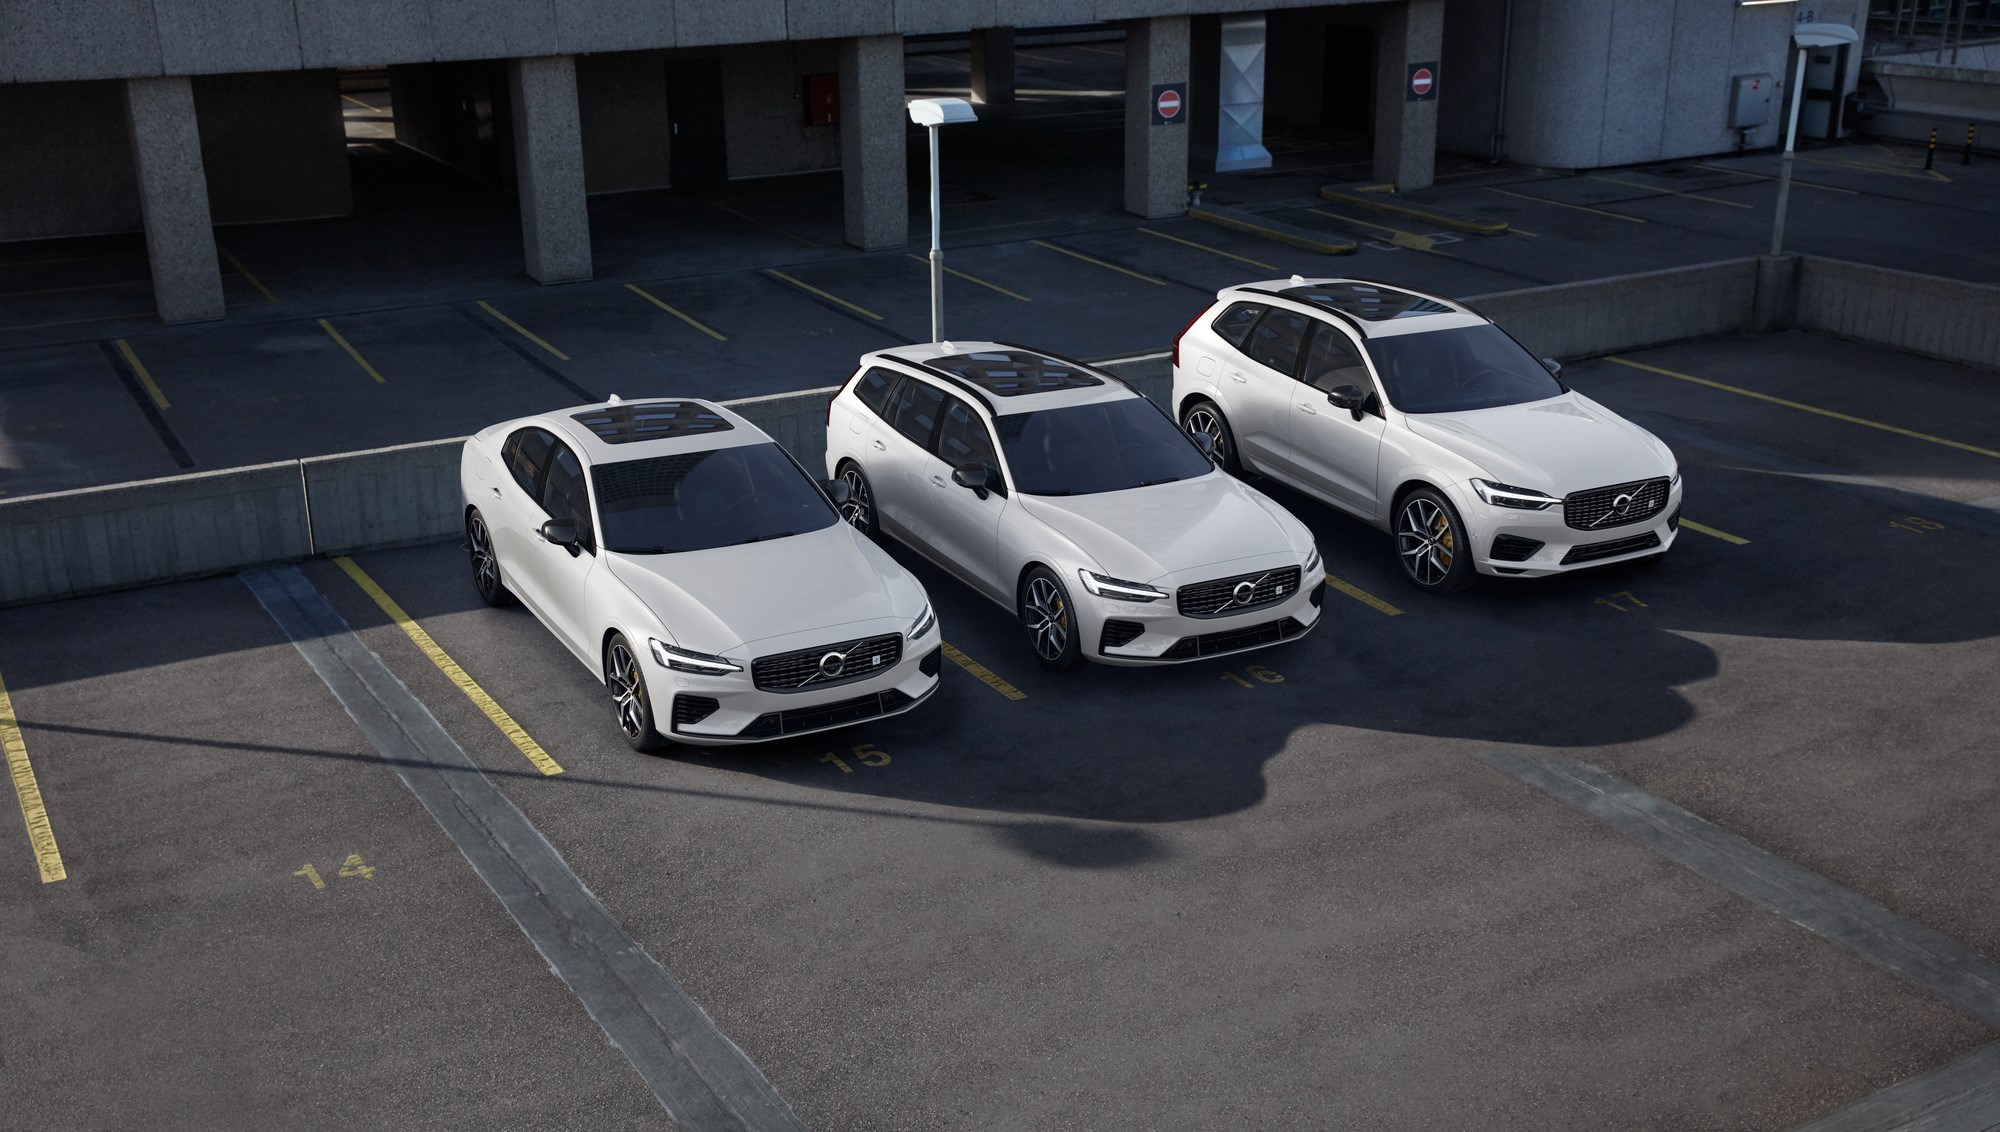 2019 Volvo Polestar lineup